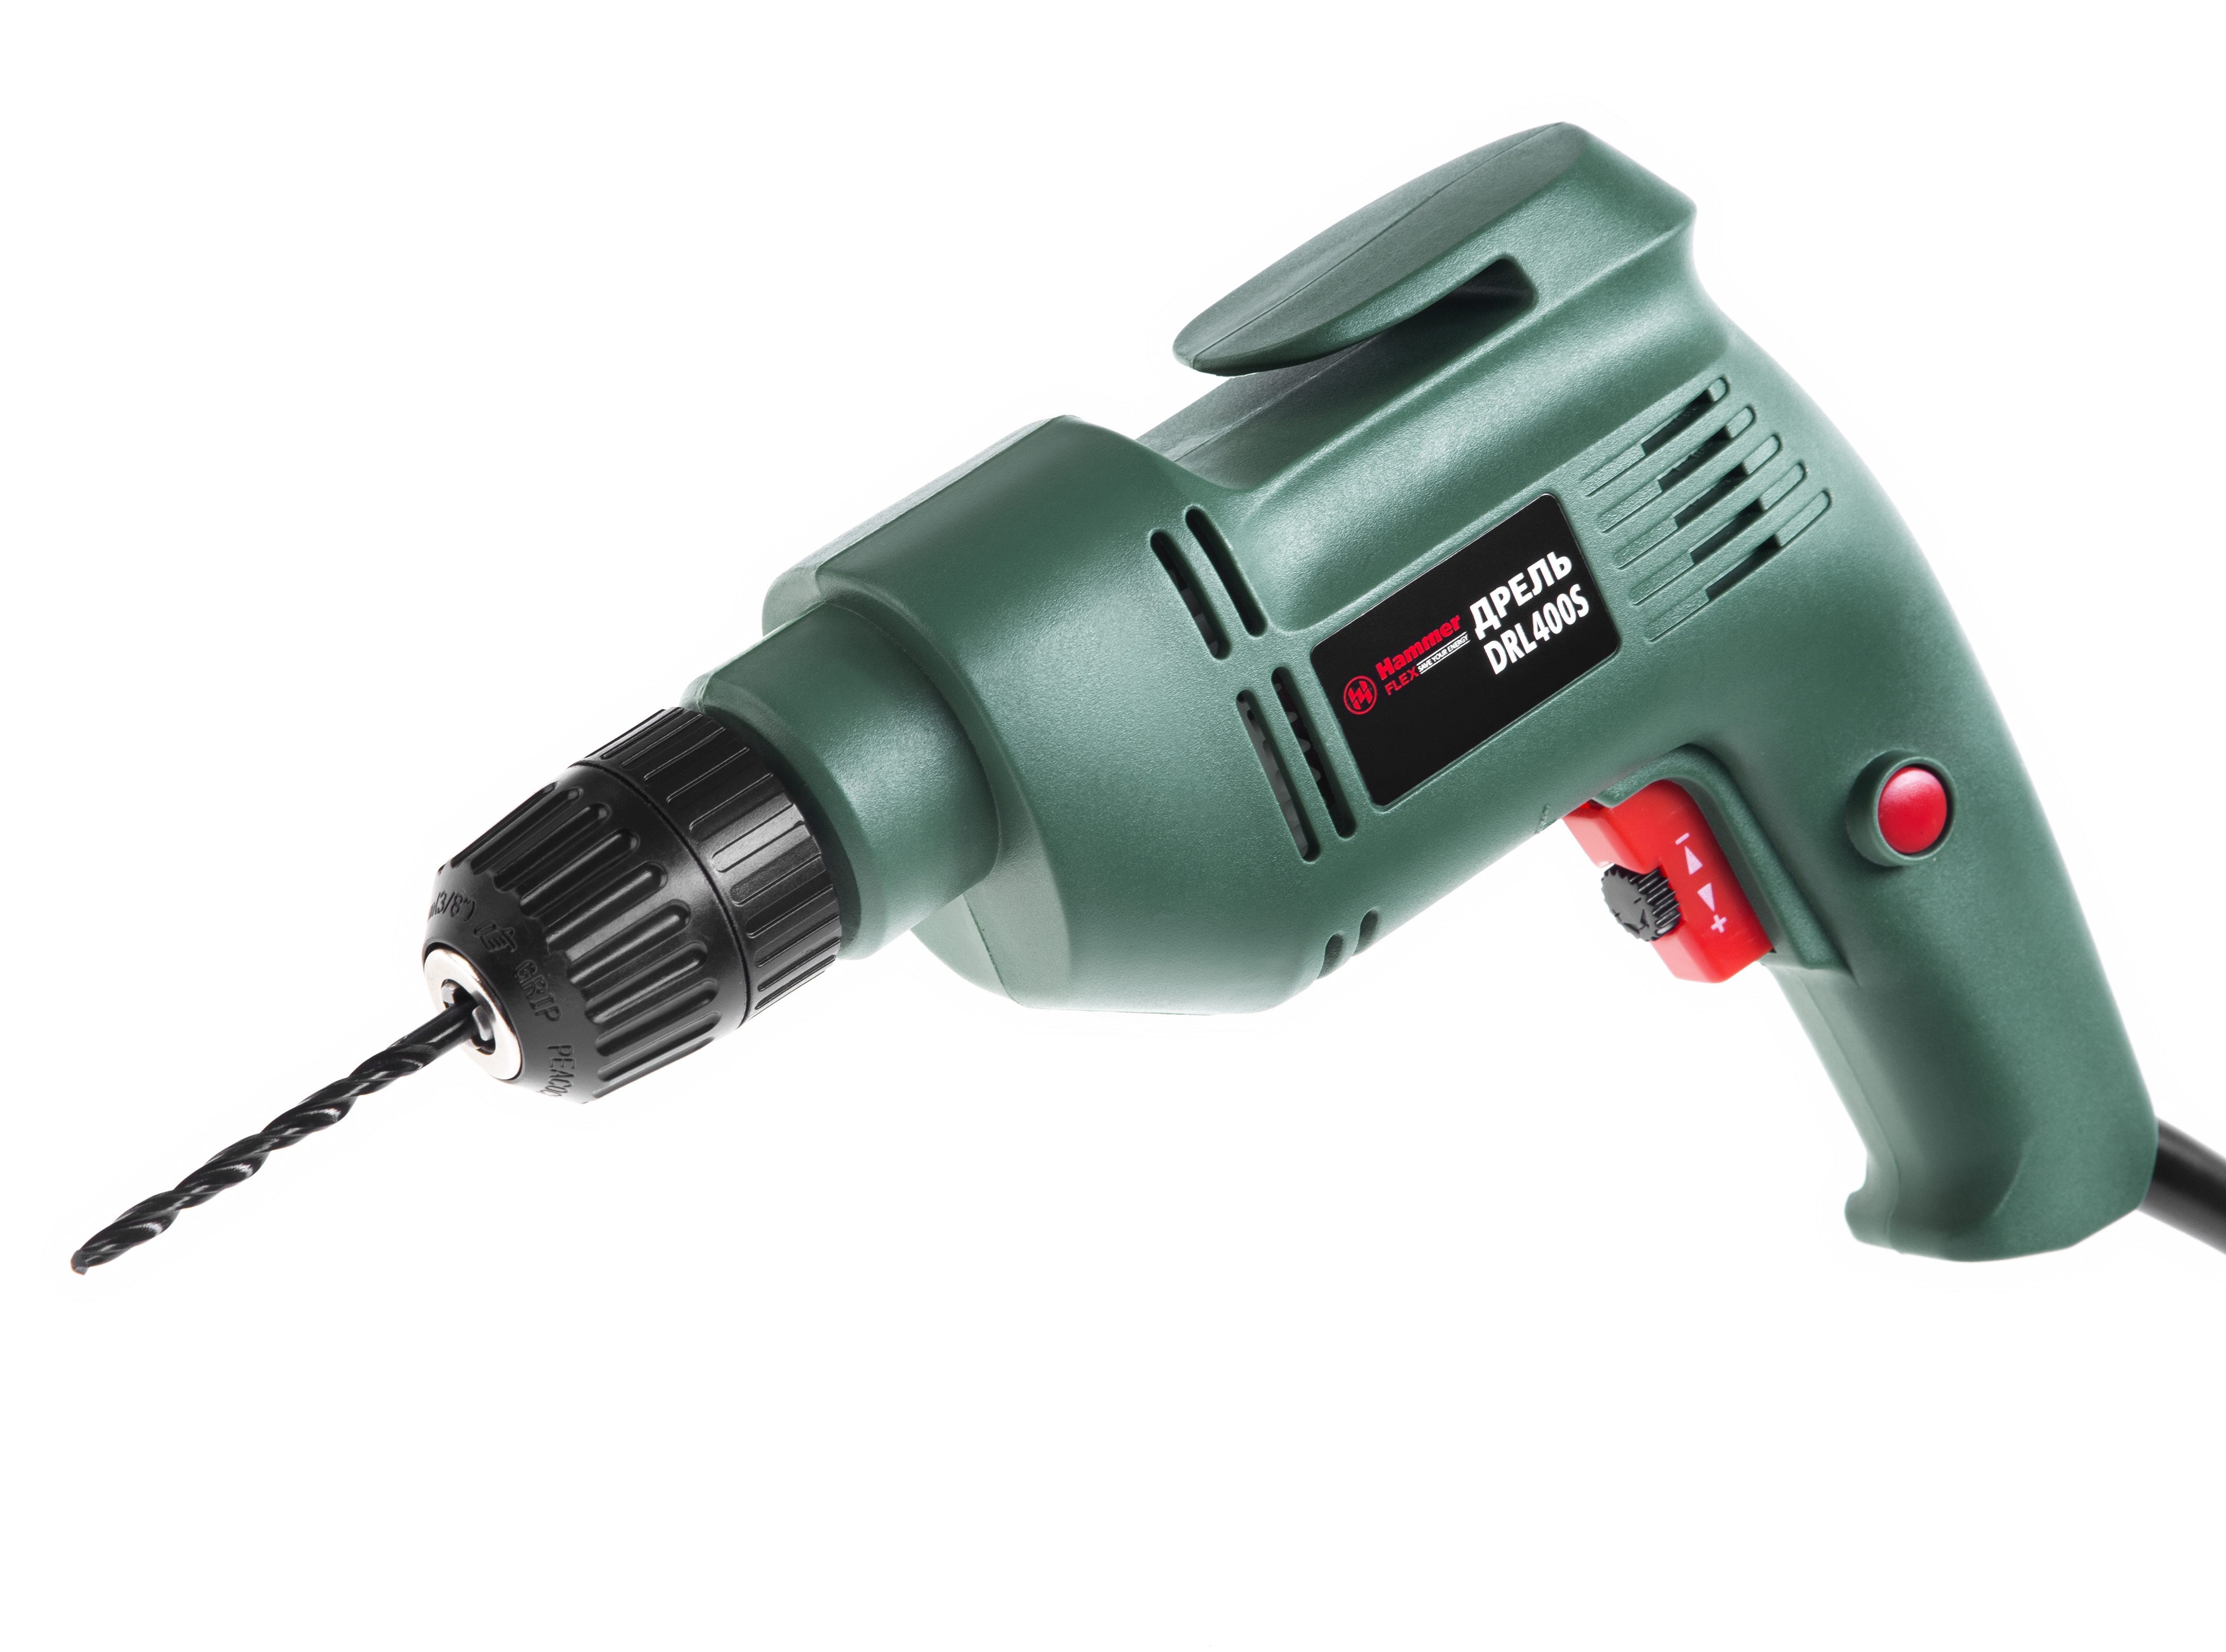 Дрель Hammer Flex drl400s дрель hammer flex drl400